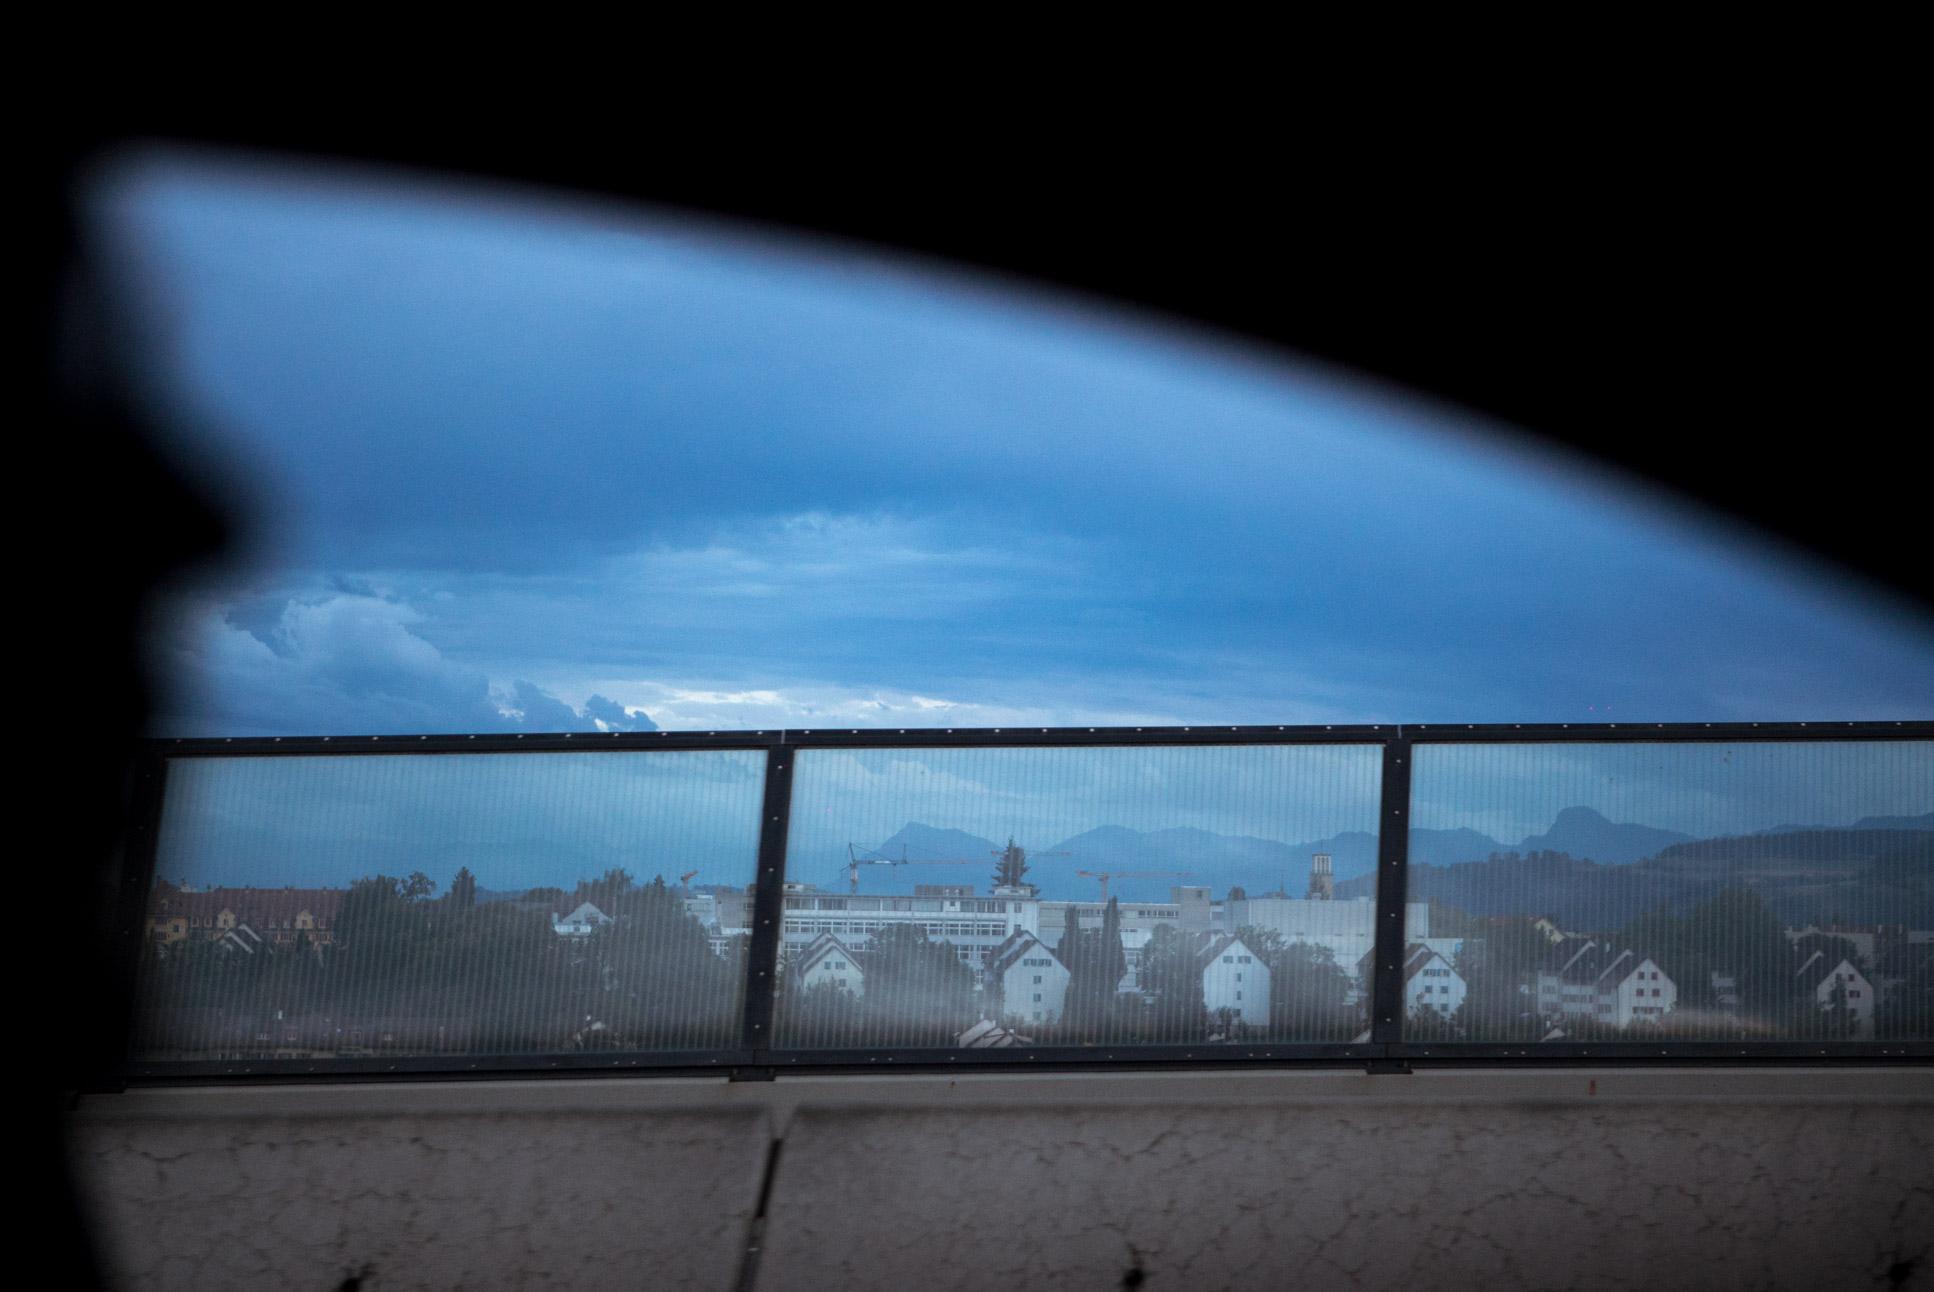 Felsenauviadukt in Bern